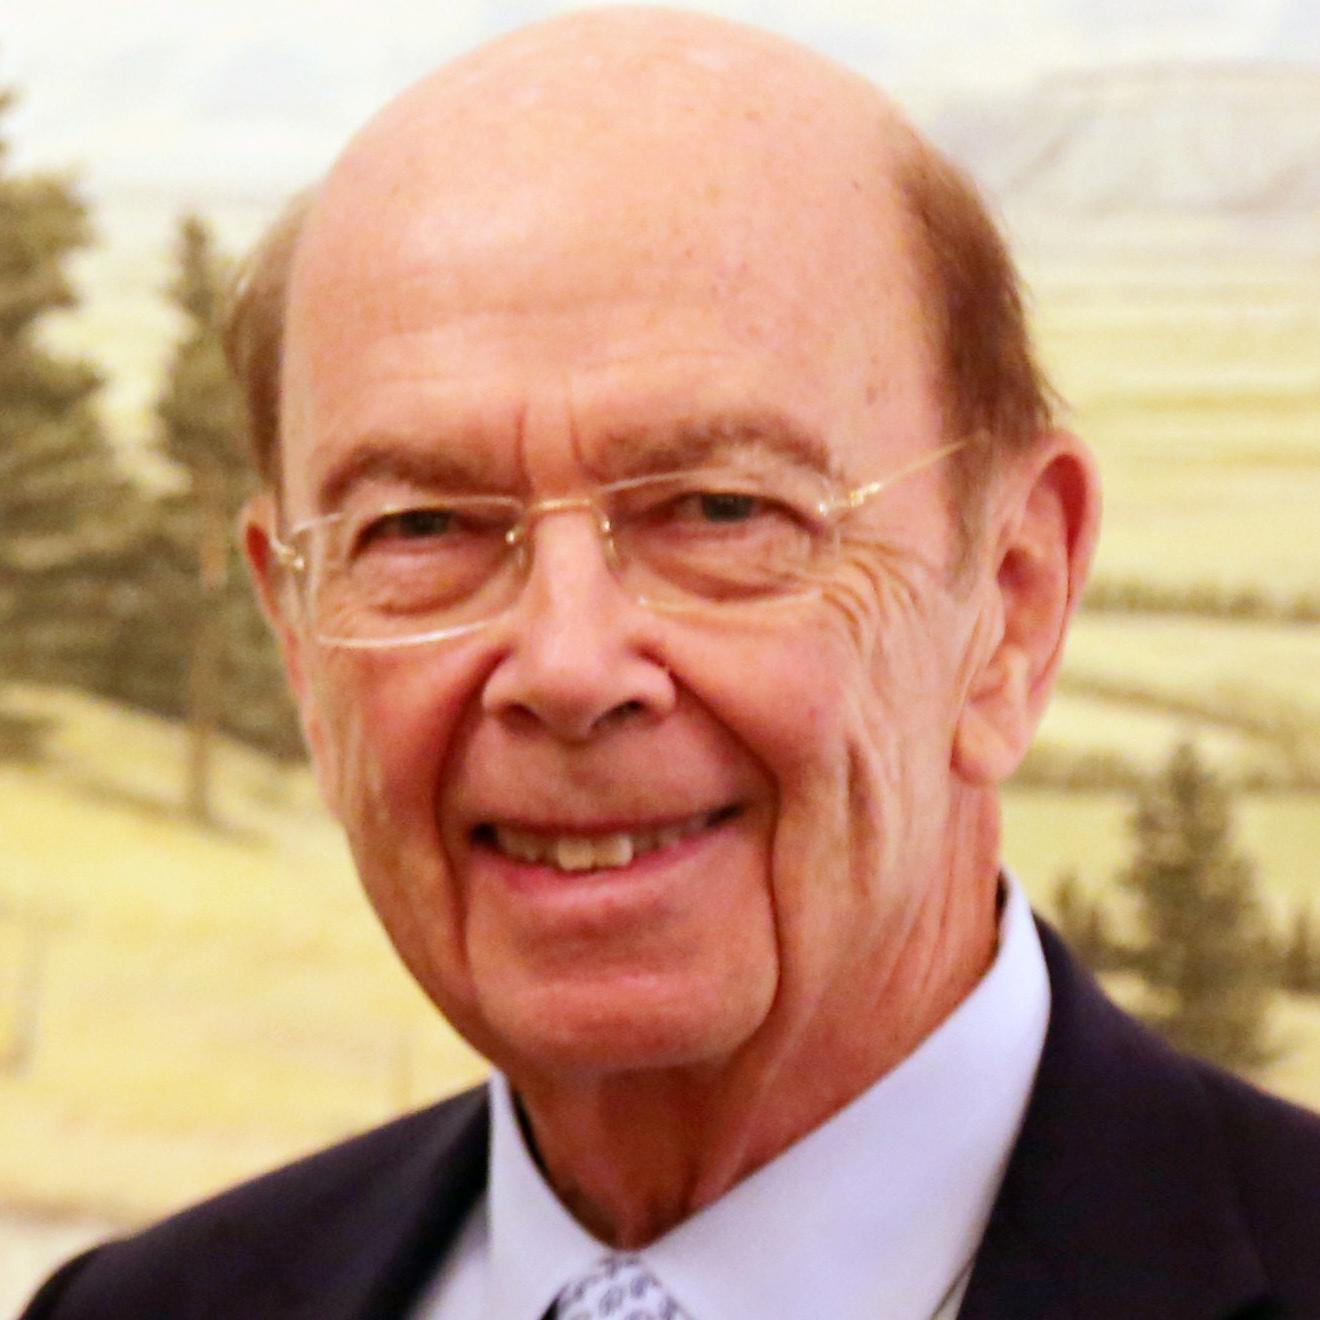 Wilbur Ross Bio, Net Worth, Facts